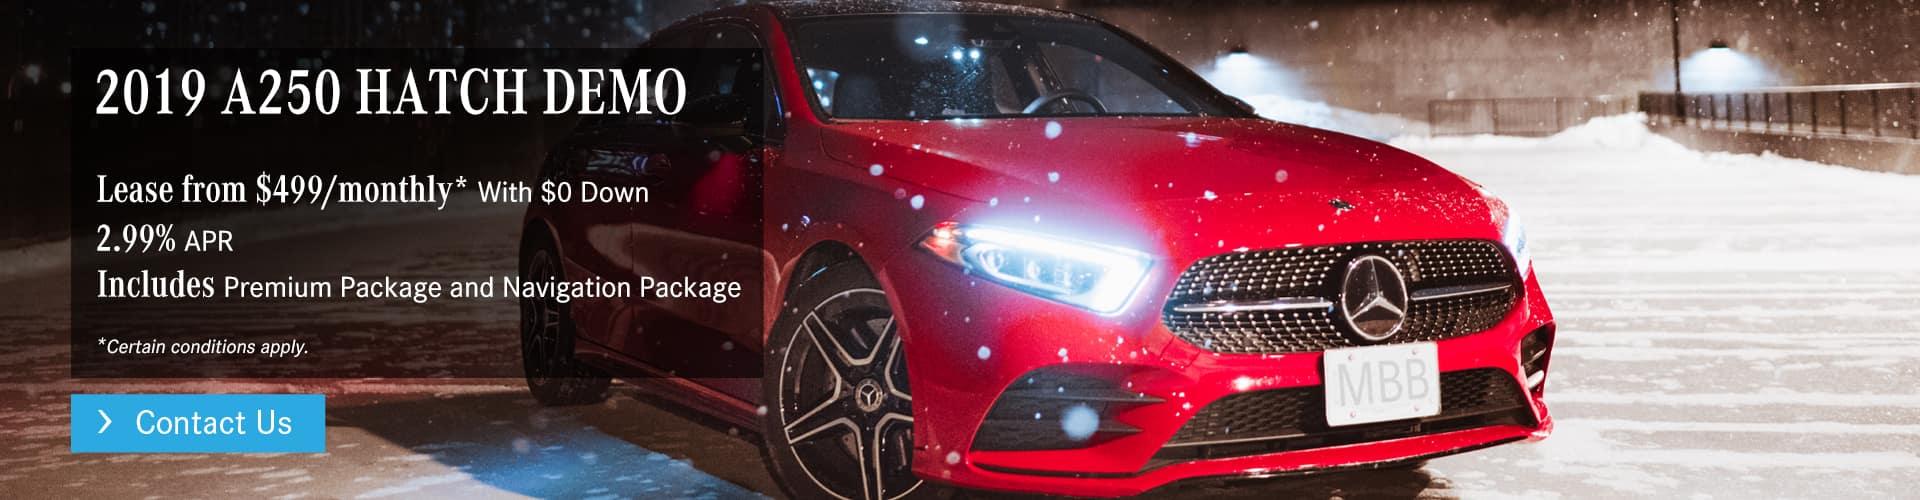 2019 A250 HATCH DEMO Offer at Mercedes-Benz Burlington